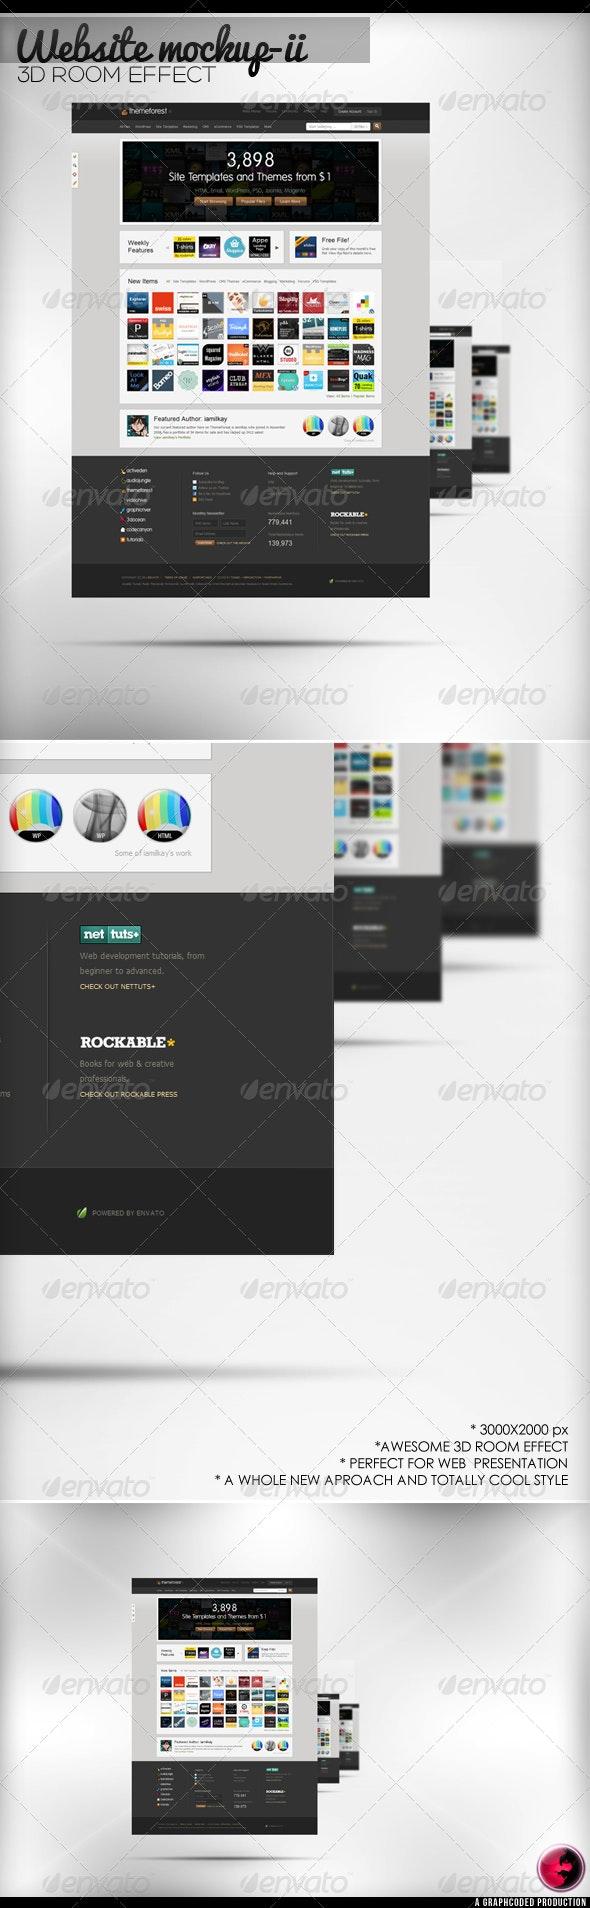 3D Room WEB Mock-Up Version-II - Website Displays